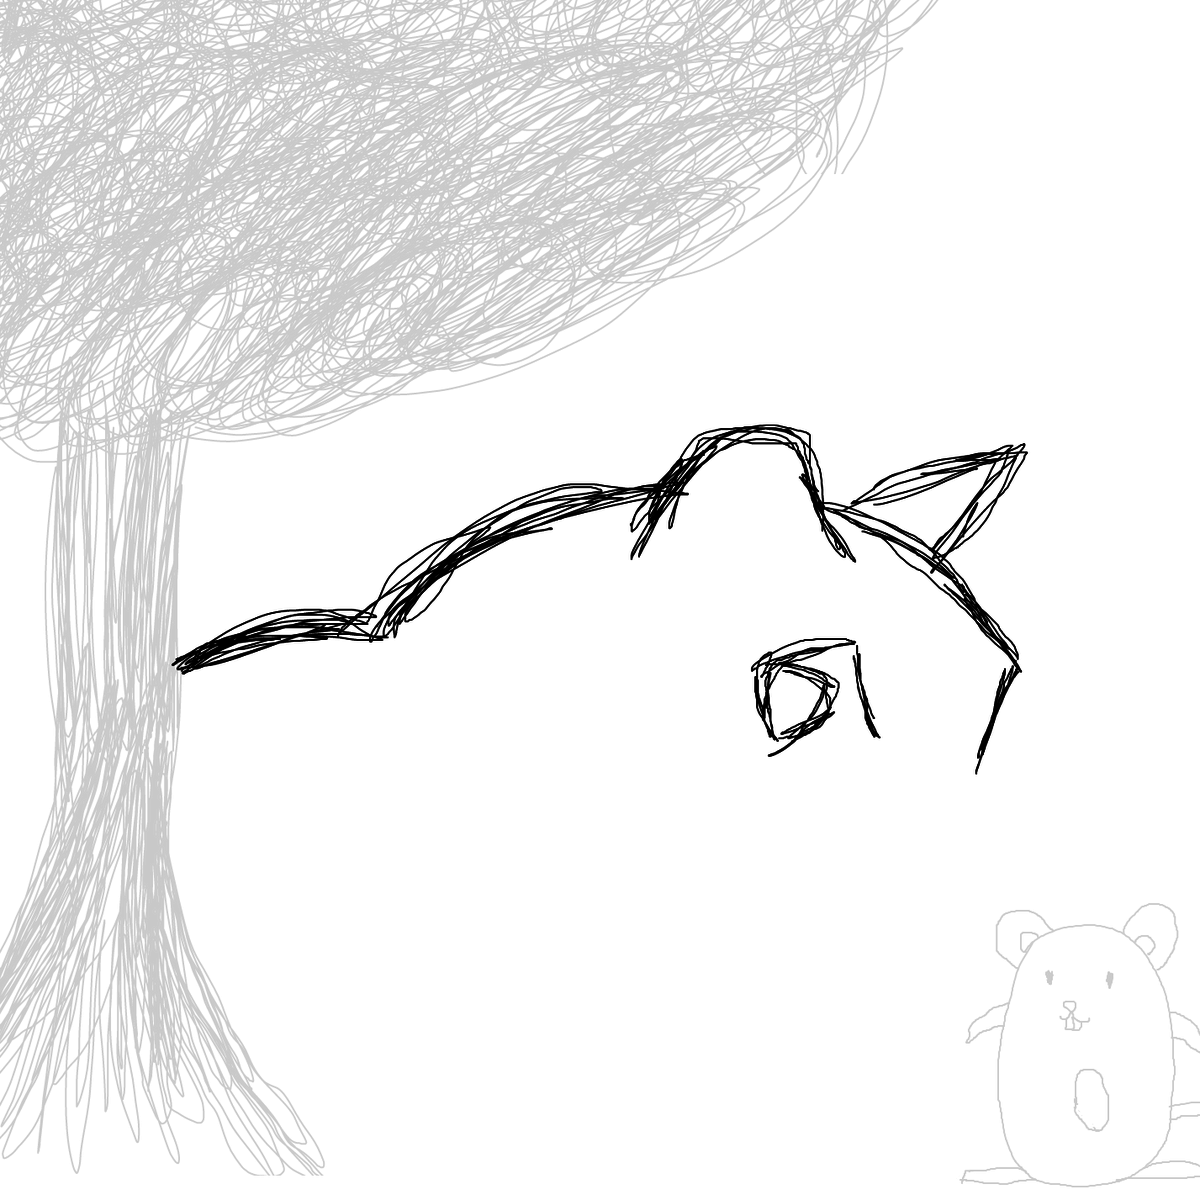 BAAAM drawing#16961 lat:51.2066917419433600lng: 3.2593202590942383